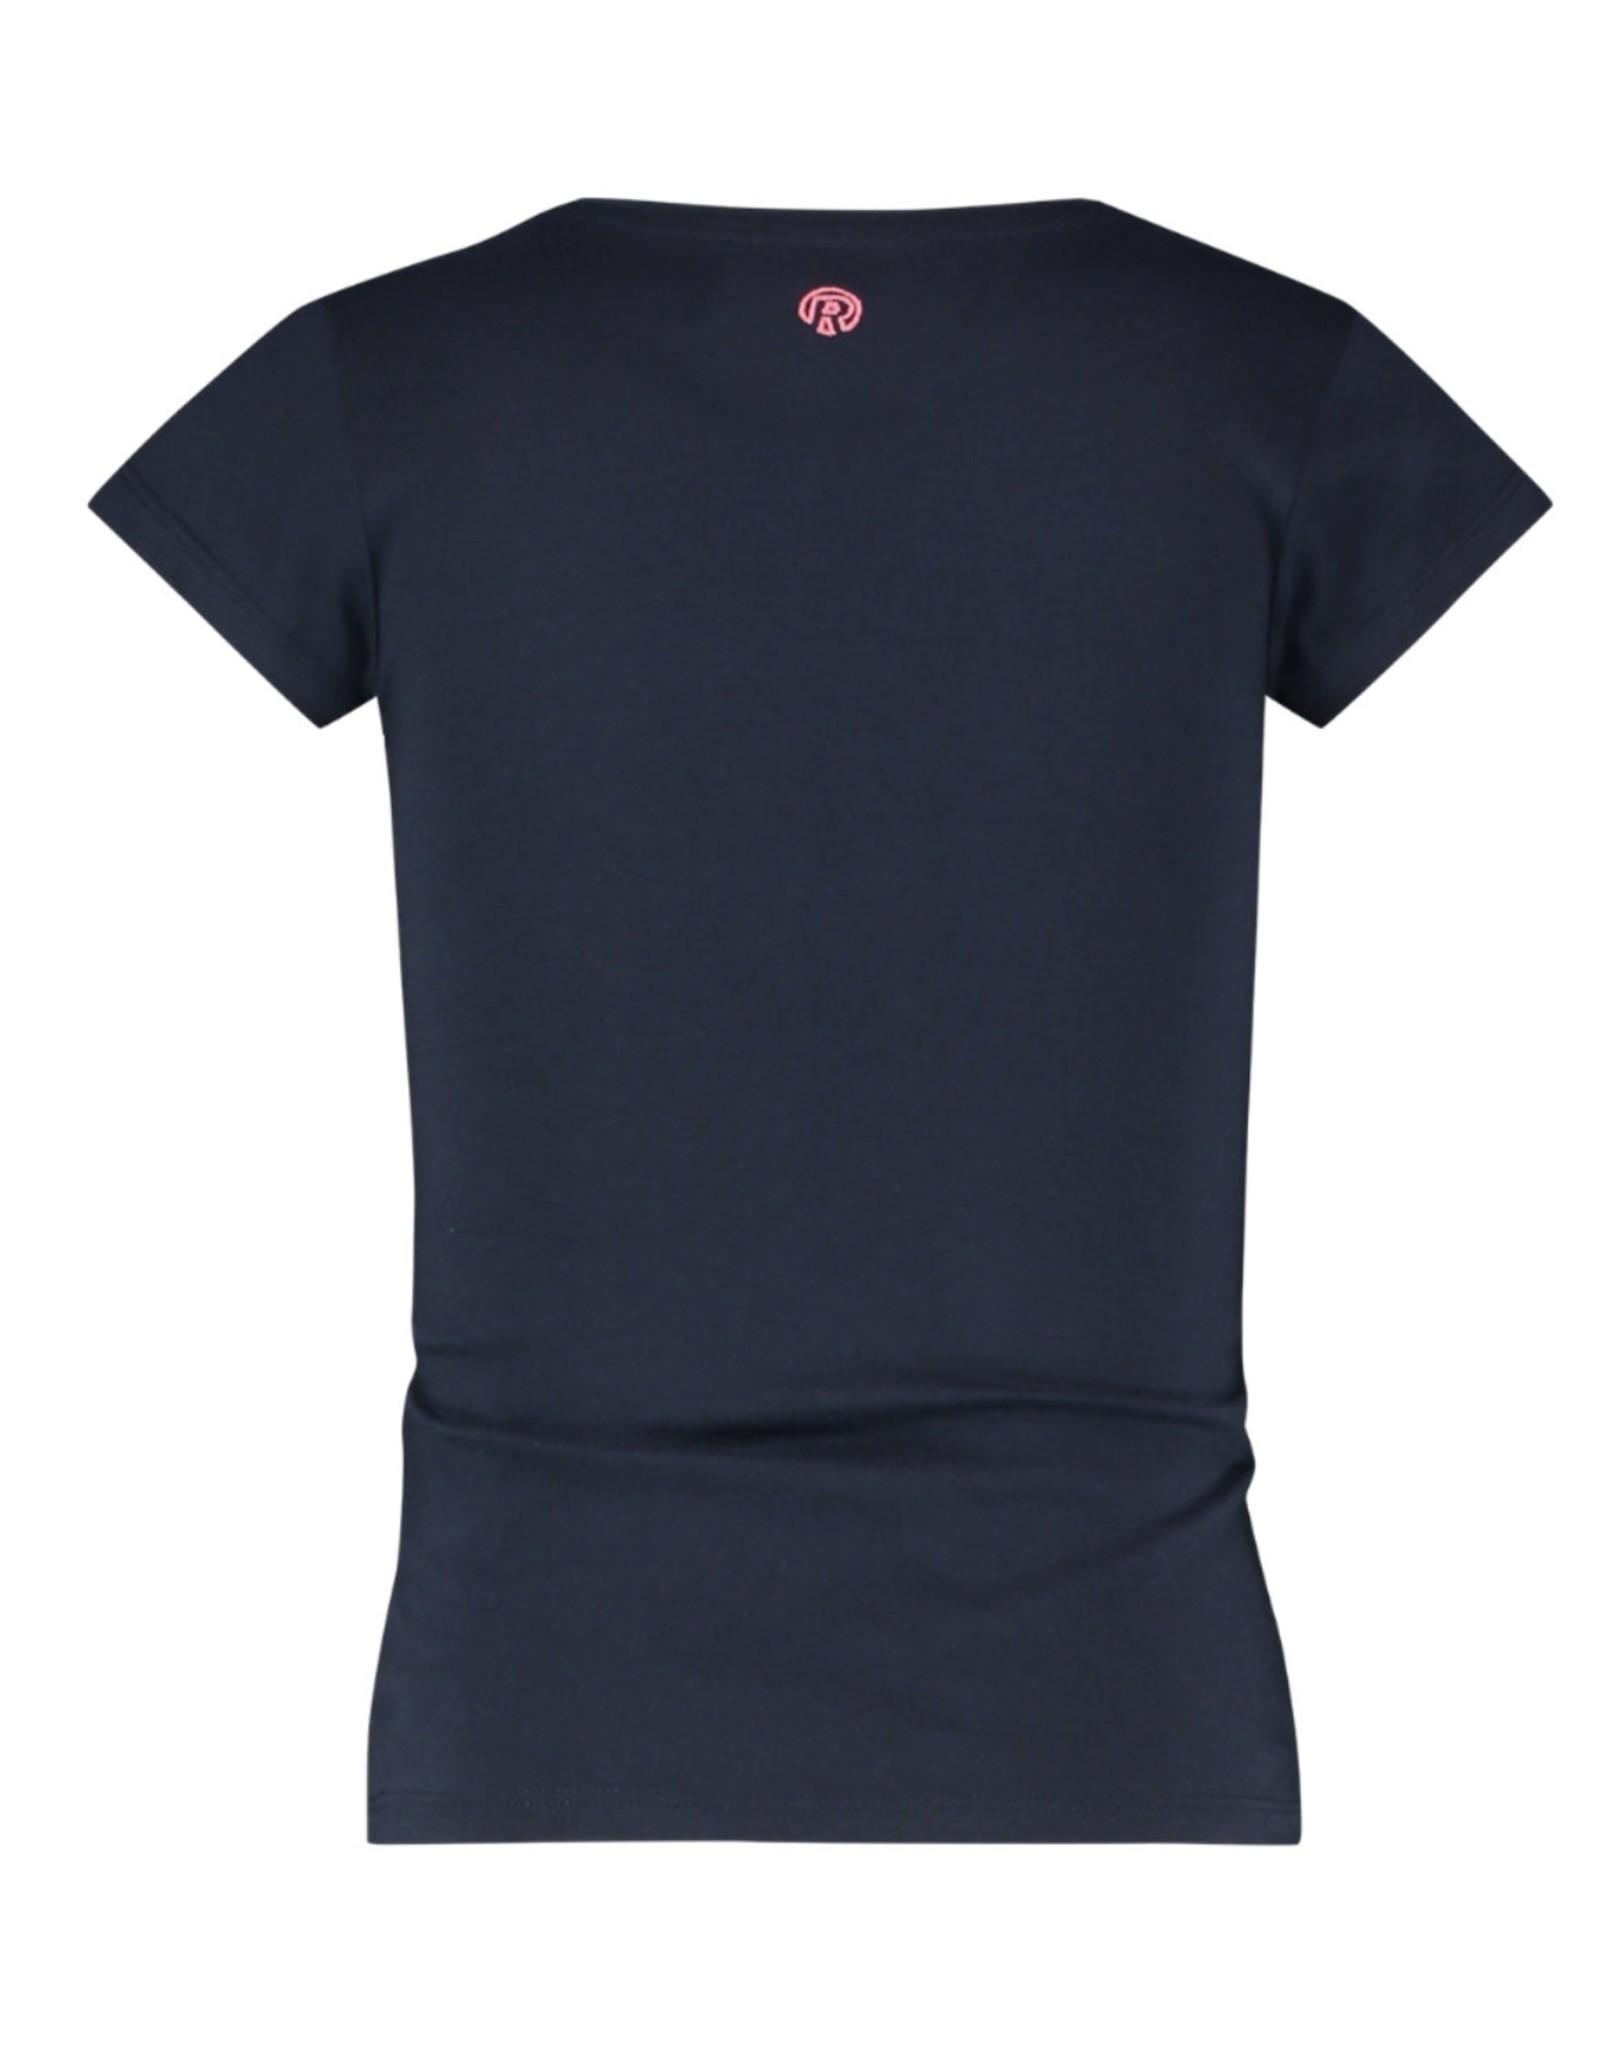 Raizzed Florence T-Shirt